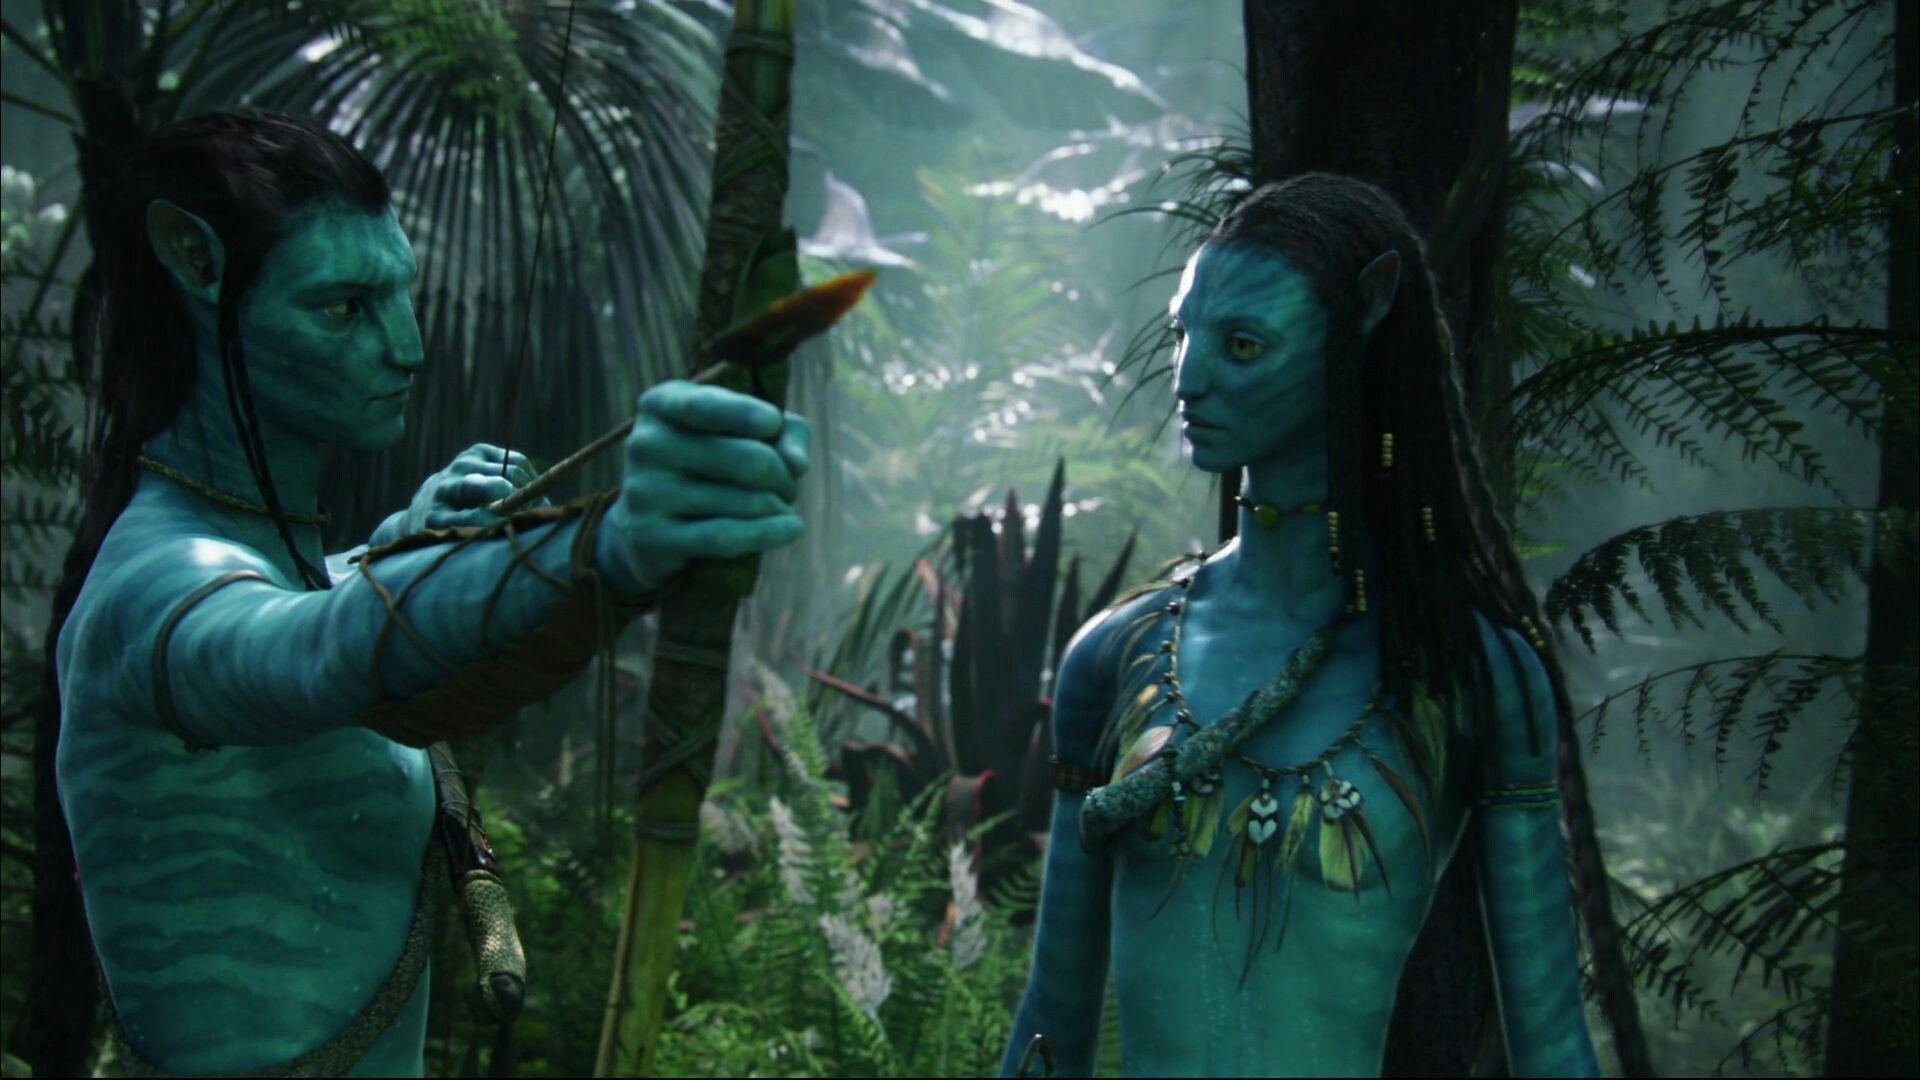 Pin by Juji Lozano on avatar jake and neytiri Avatar